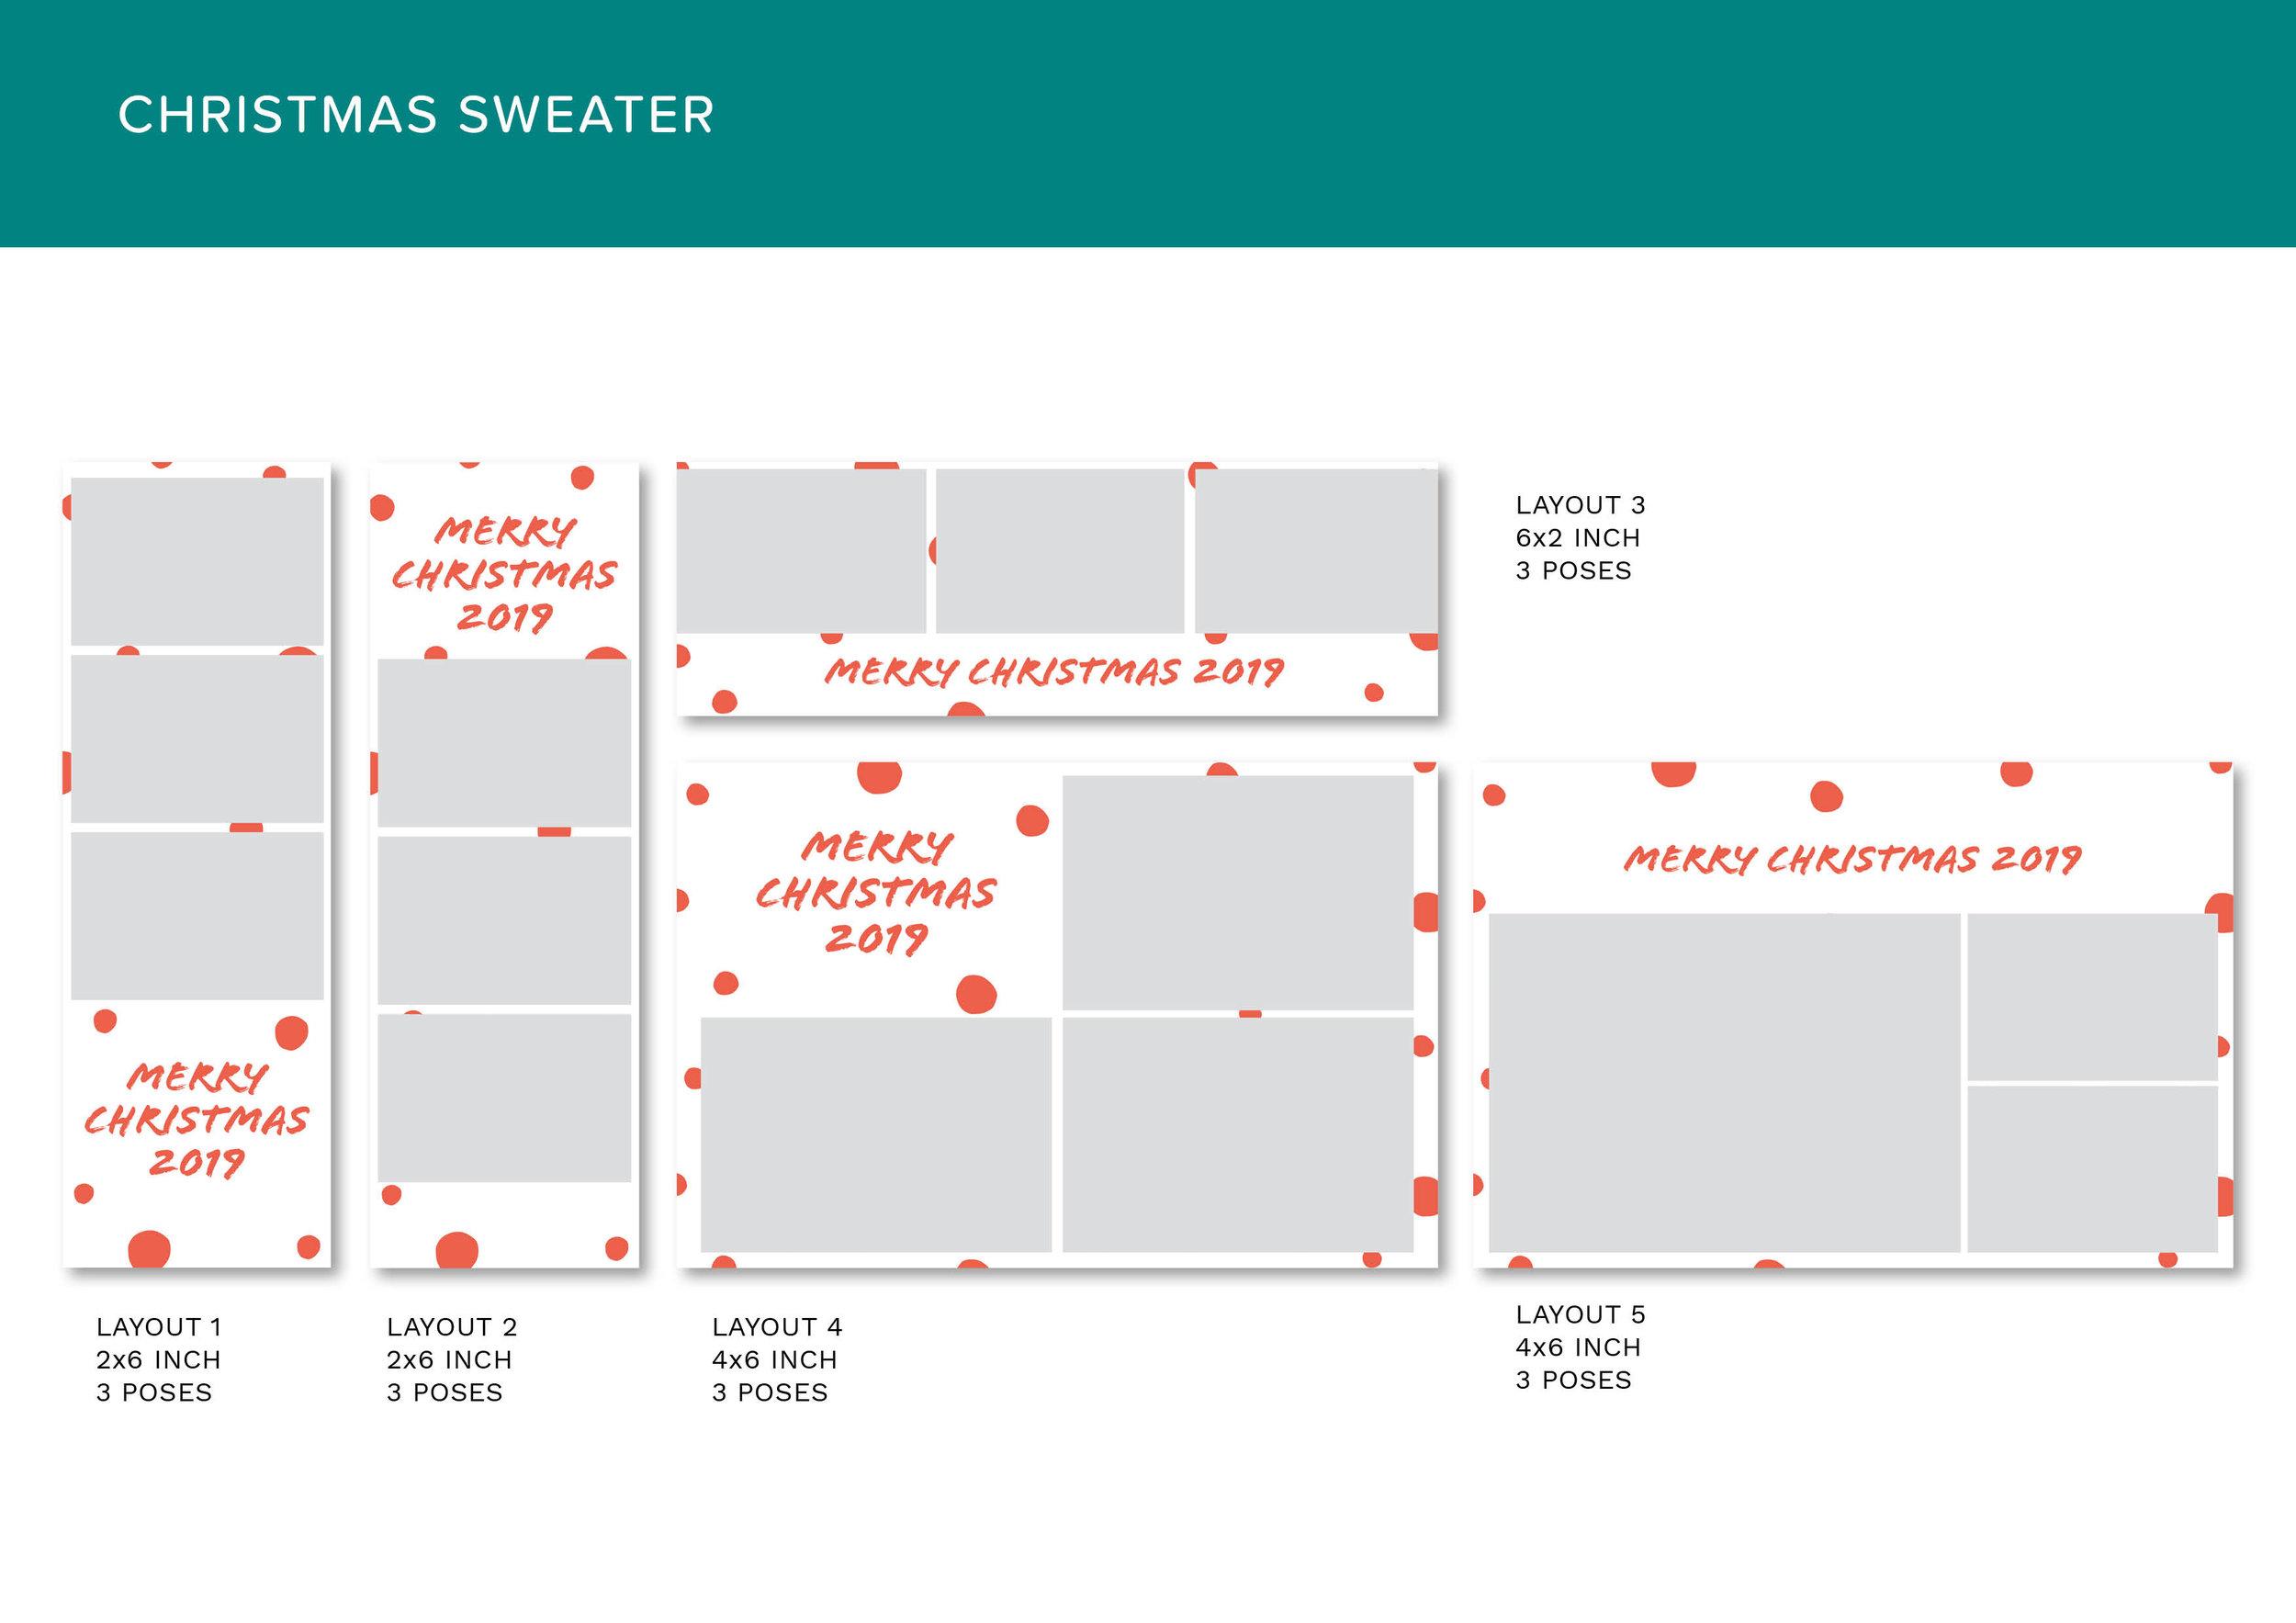 photo-corner-xmas-photo-booth-christmas sweater.jpg